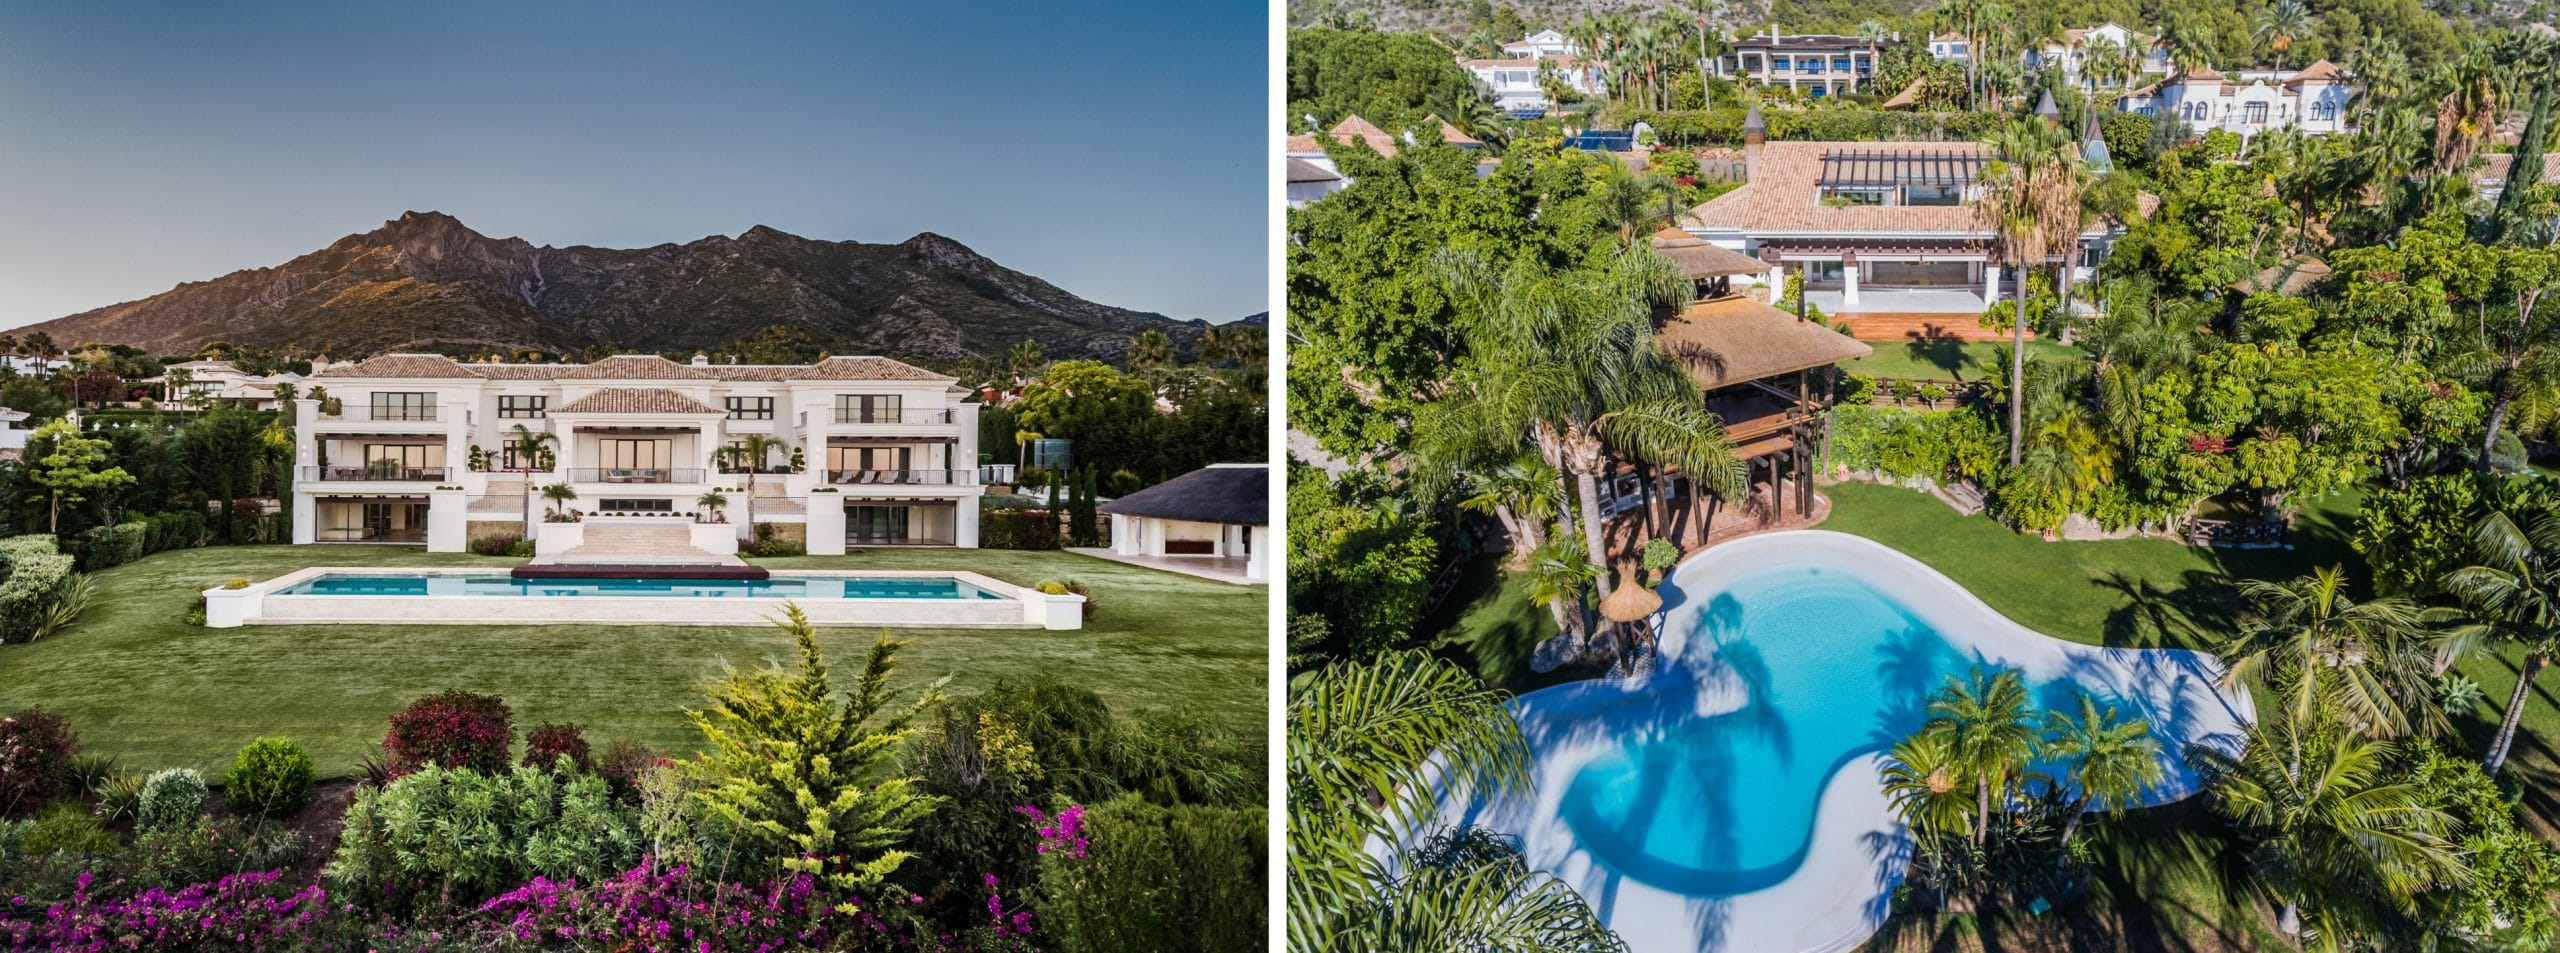 Sold villas in Golden Mile, Marbella